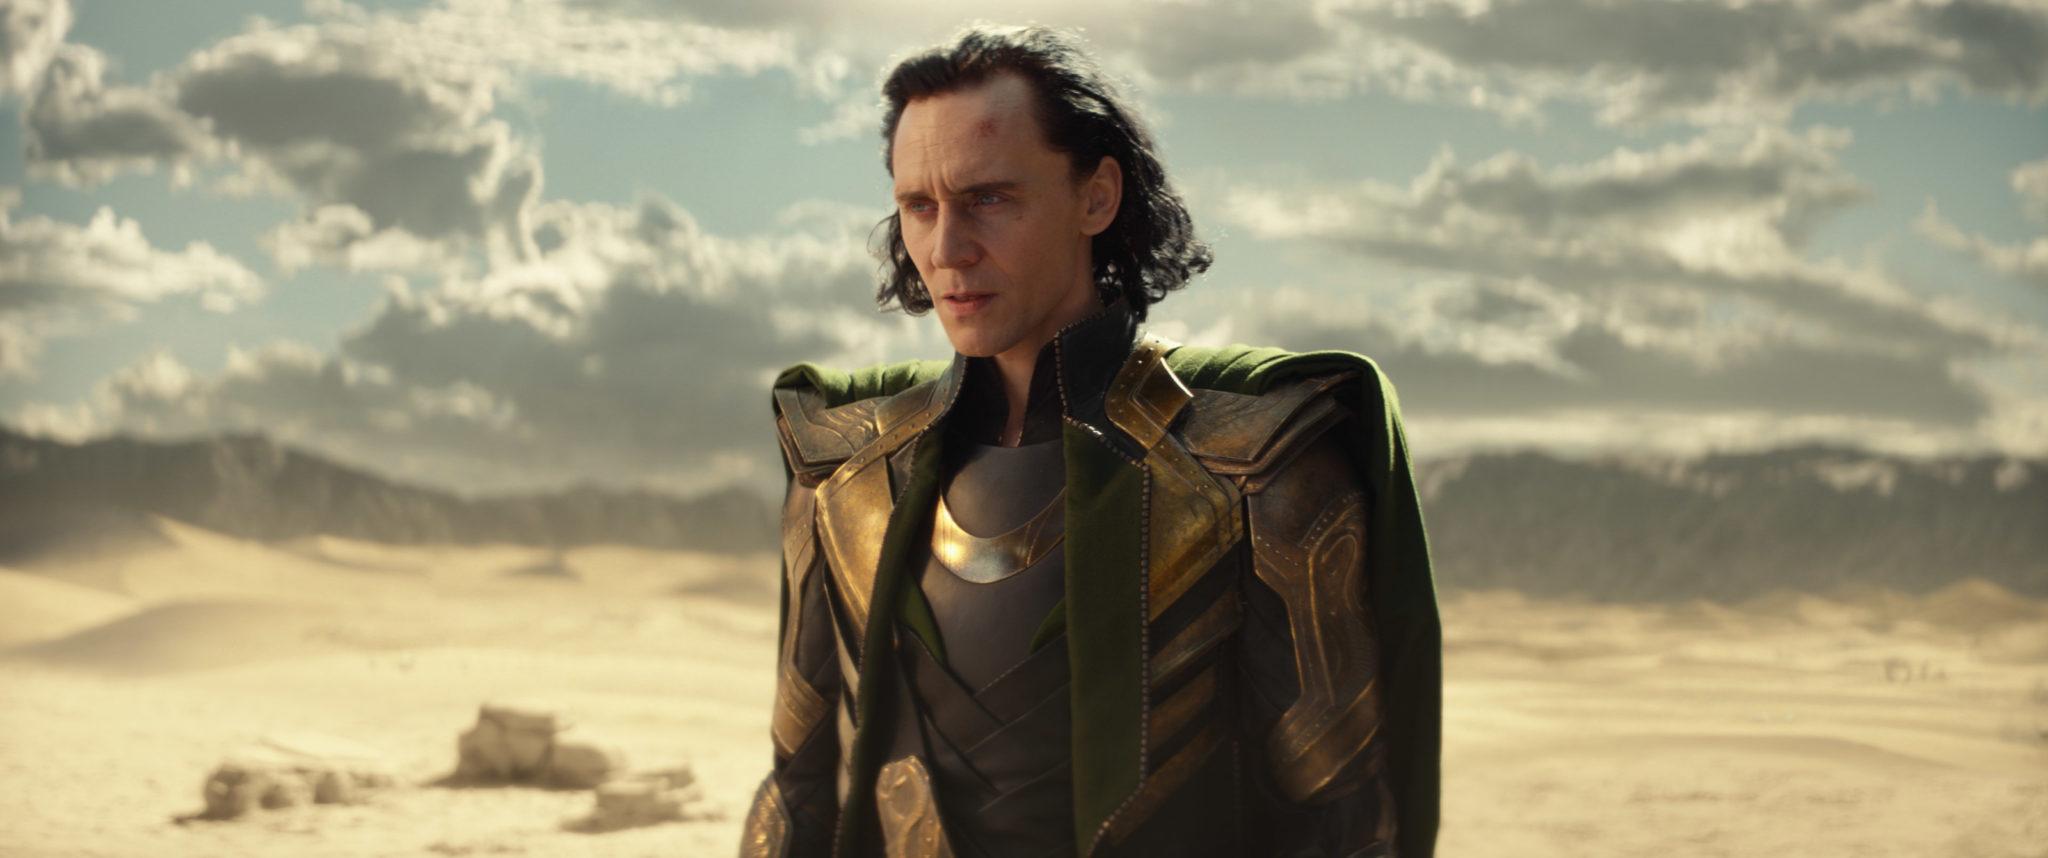 Loki Episode 6 Final Episode Reddit Spoiler Leak Online On Watch Online Disney+ App And Ending